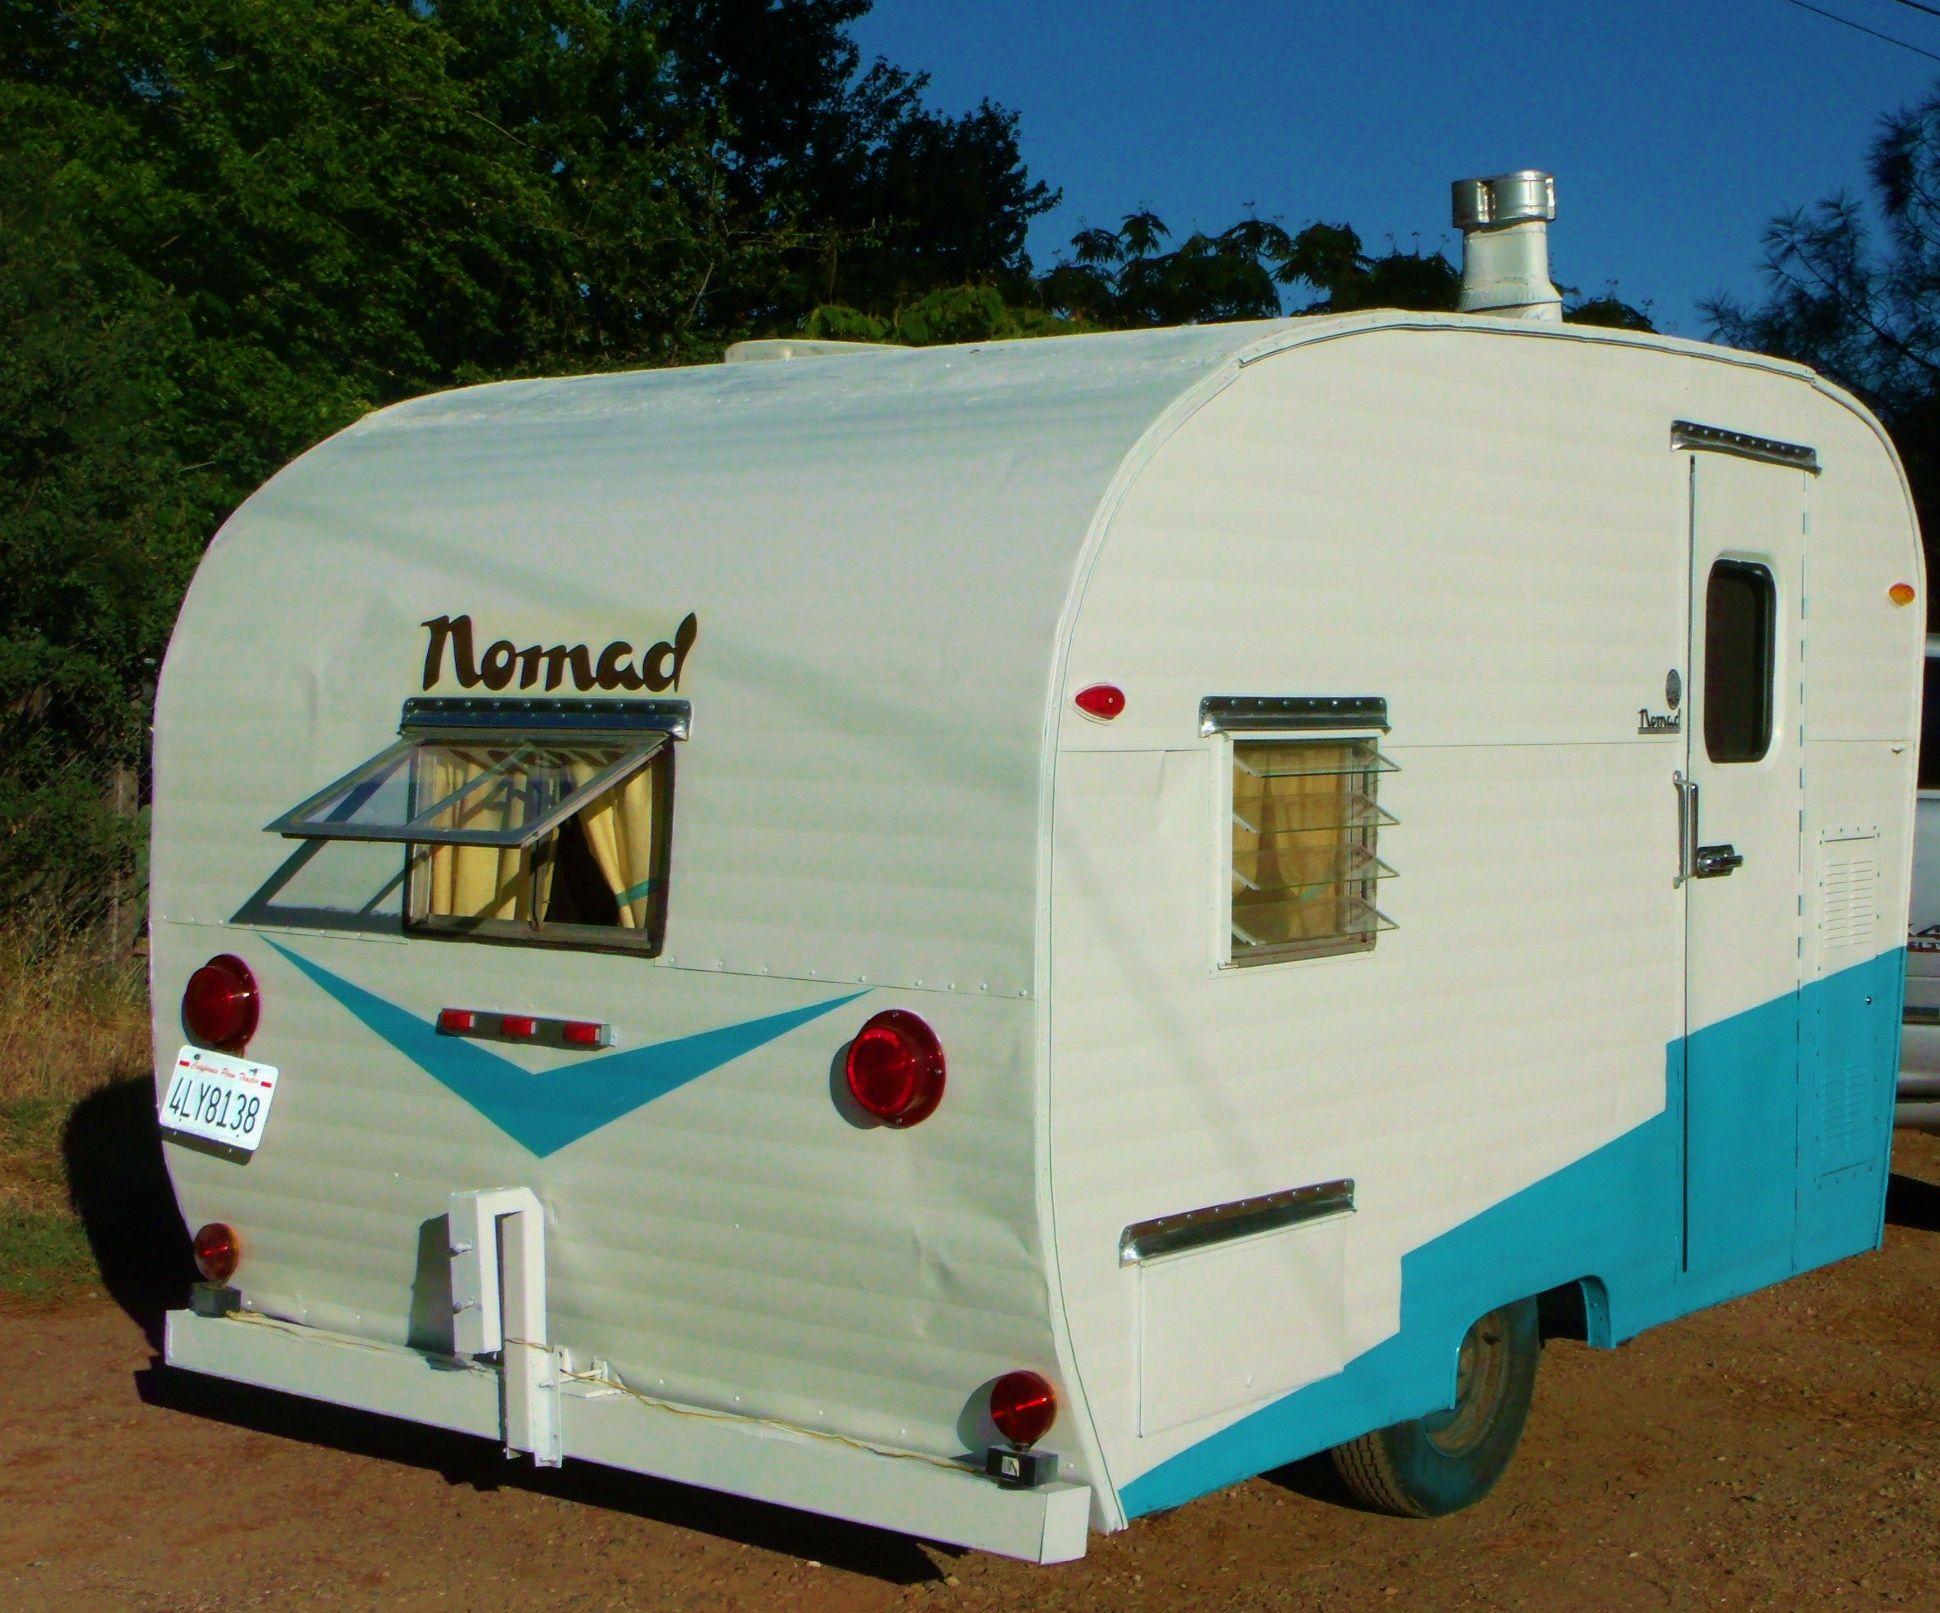 our 1958 nomad vintage travel trailers we have restored vintage trailers vintage camper. Black Bedroom Furniture Sets. Home Design Ideas